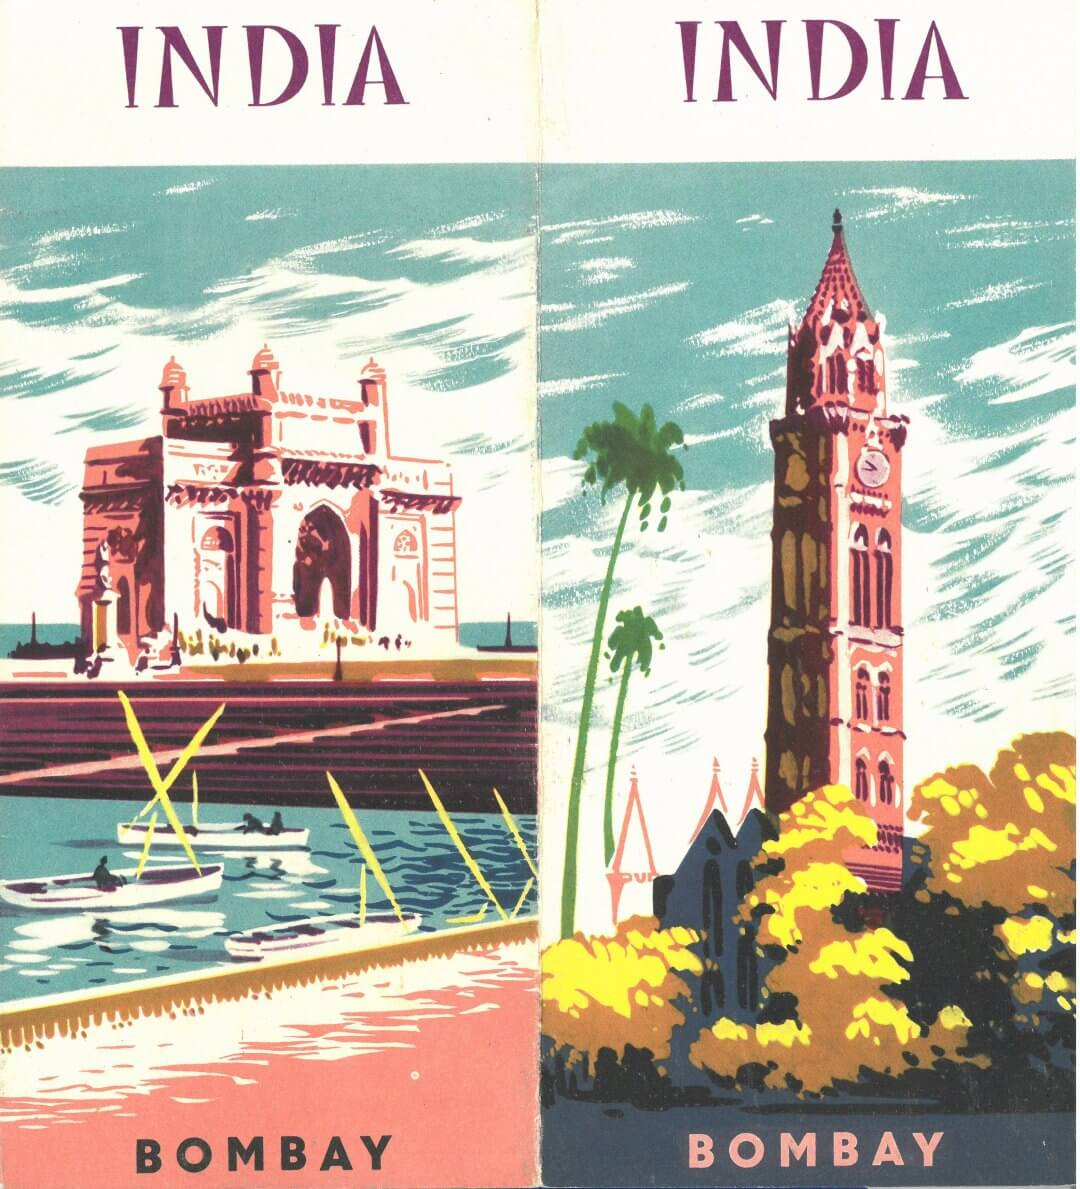 Bombay (Mumbai), India